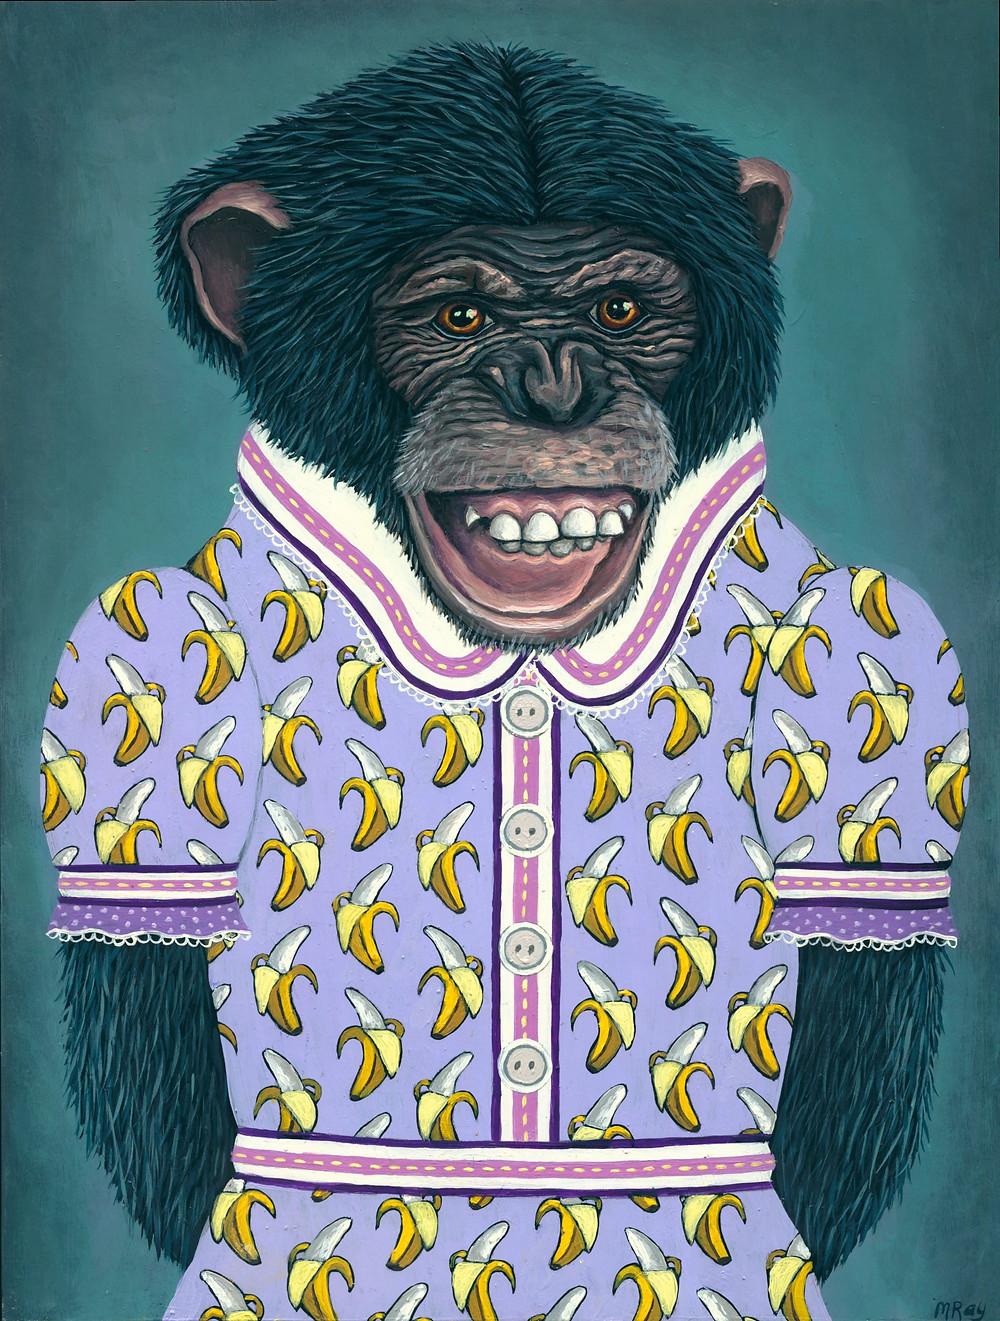 The Controversial Chimpanzee